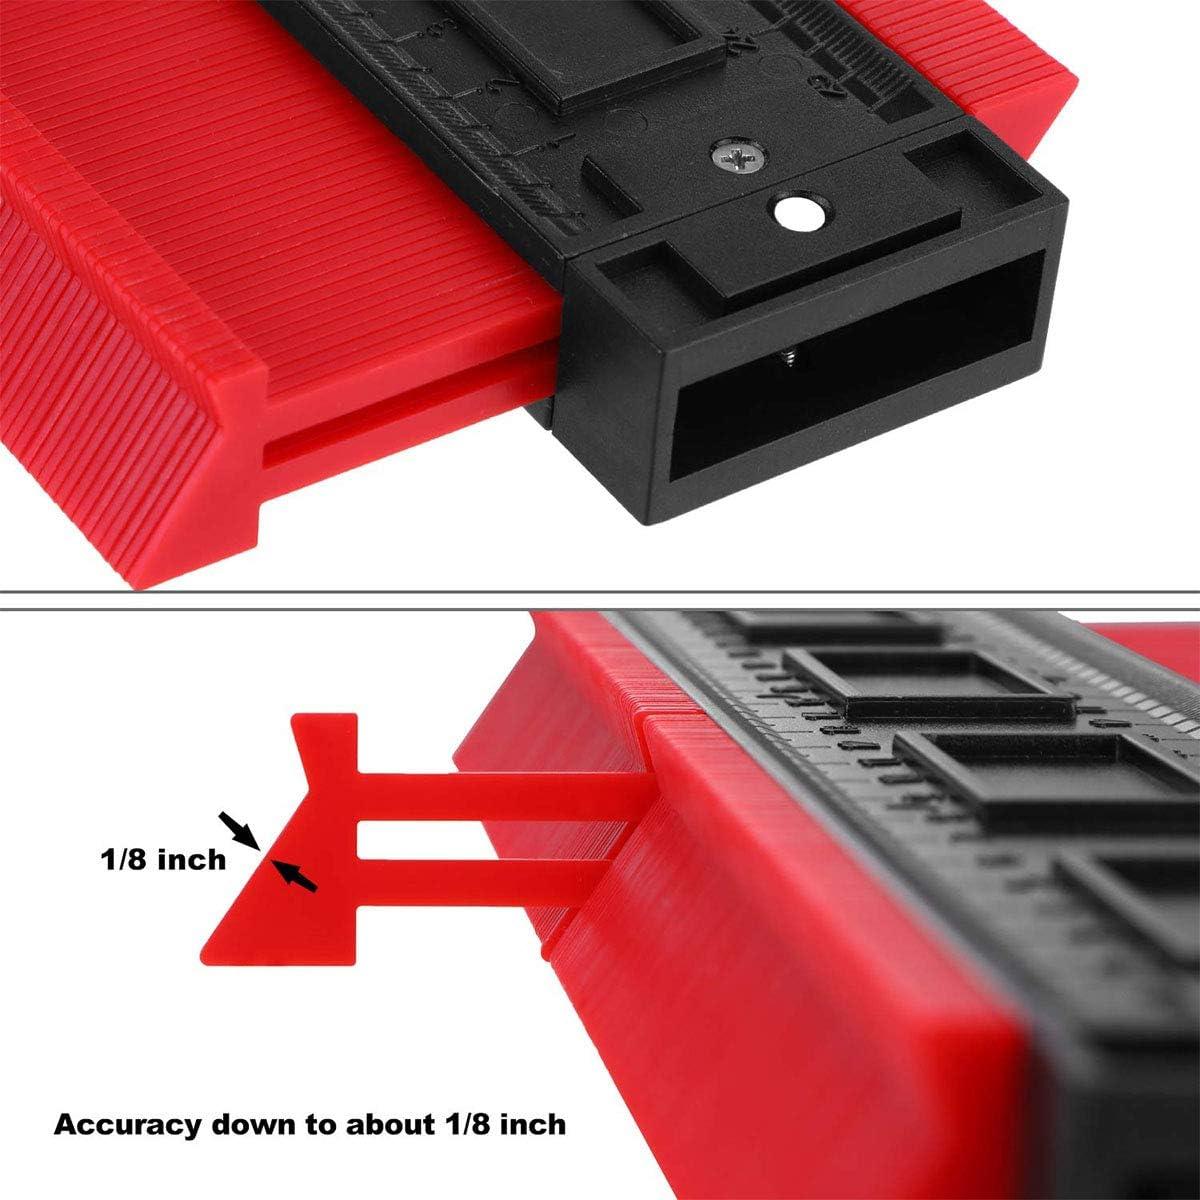 Widen Contour Gauge Duplicator,2 Pieces 5 Inch Outline Gauge for Precise Measurement Tiling Laminate and Wood Marking Tools